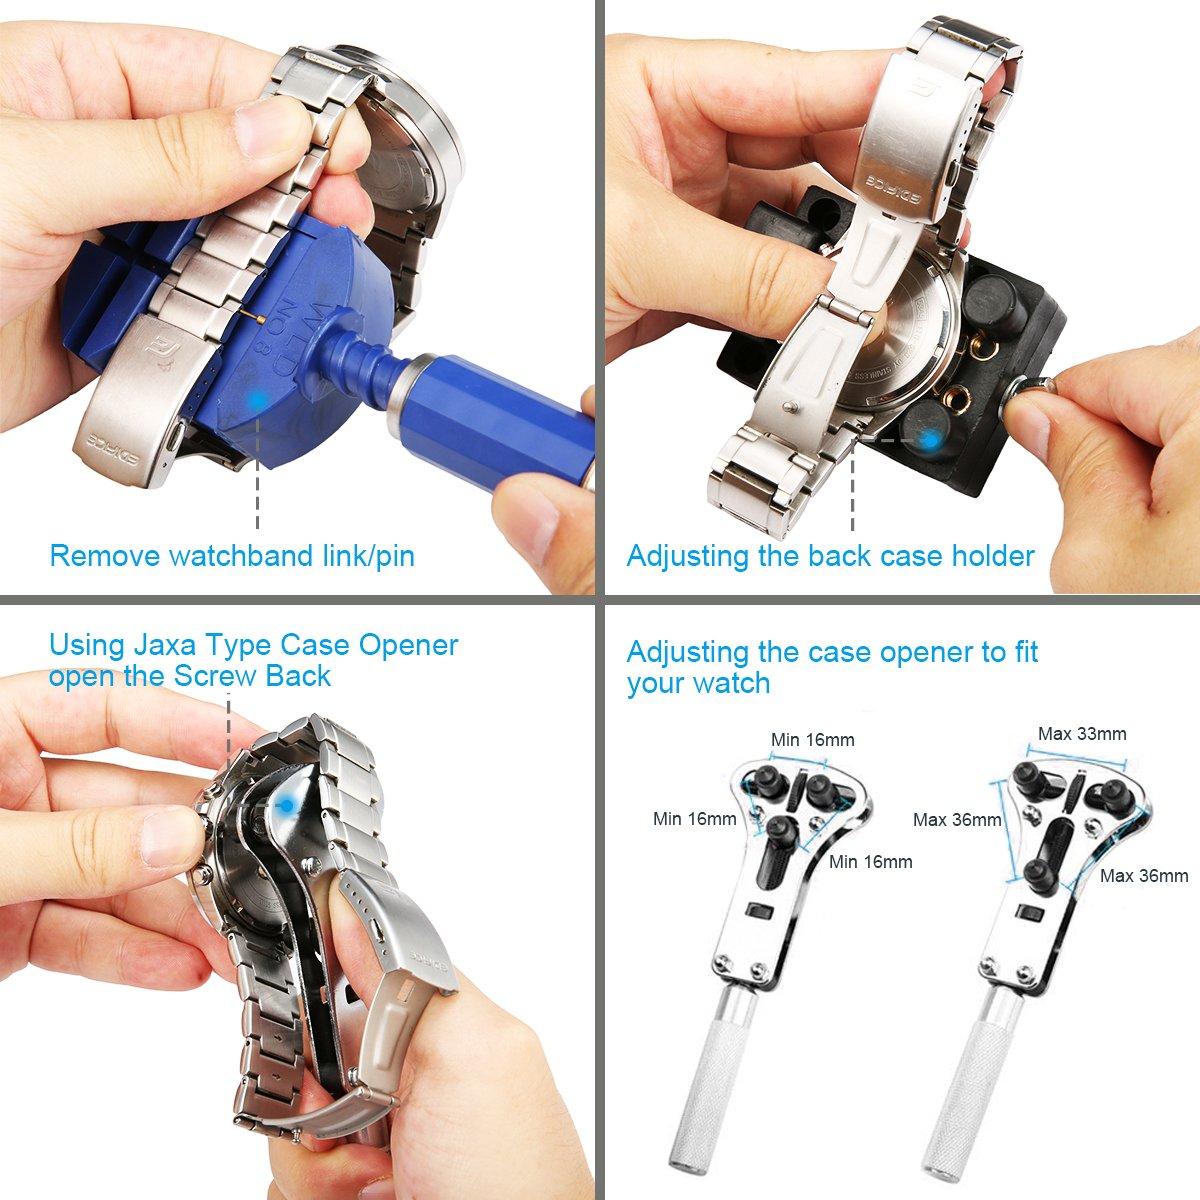 Watch Repair Kit, Baban 147 Pcs Watch Tools Professional Spring Bar Tool Set , Watch Band Link Pin Tool Set, Watch Band Link Pin Remover, Your Tools